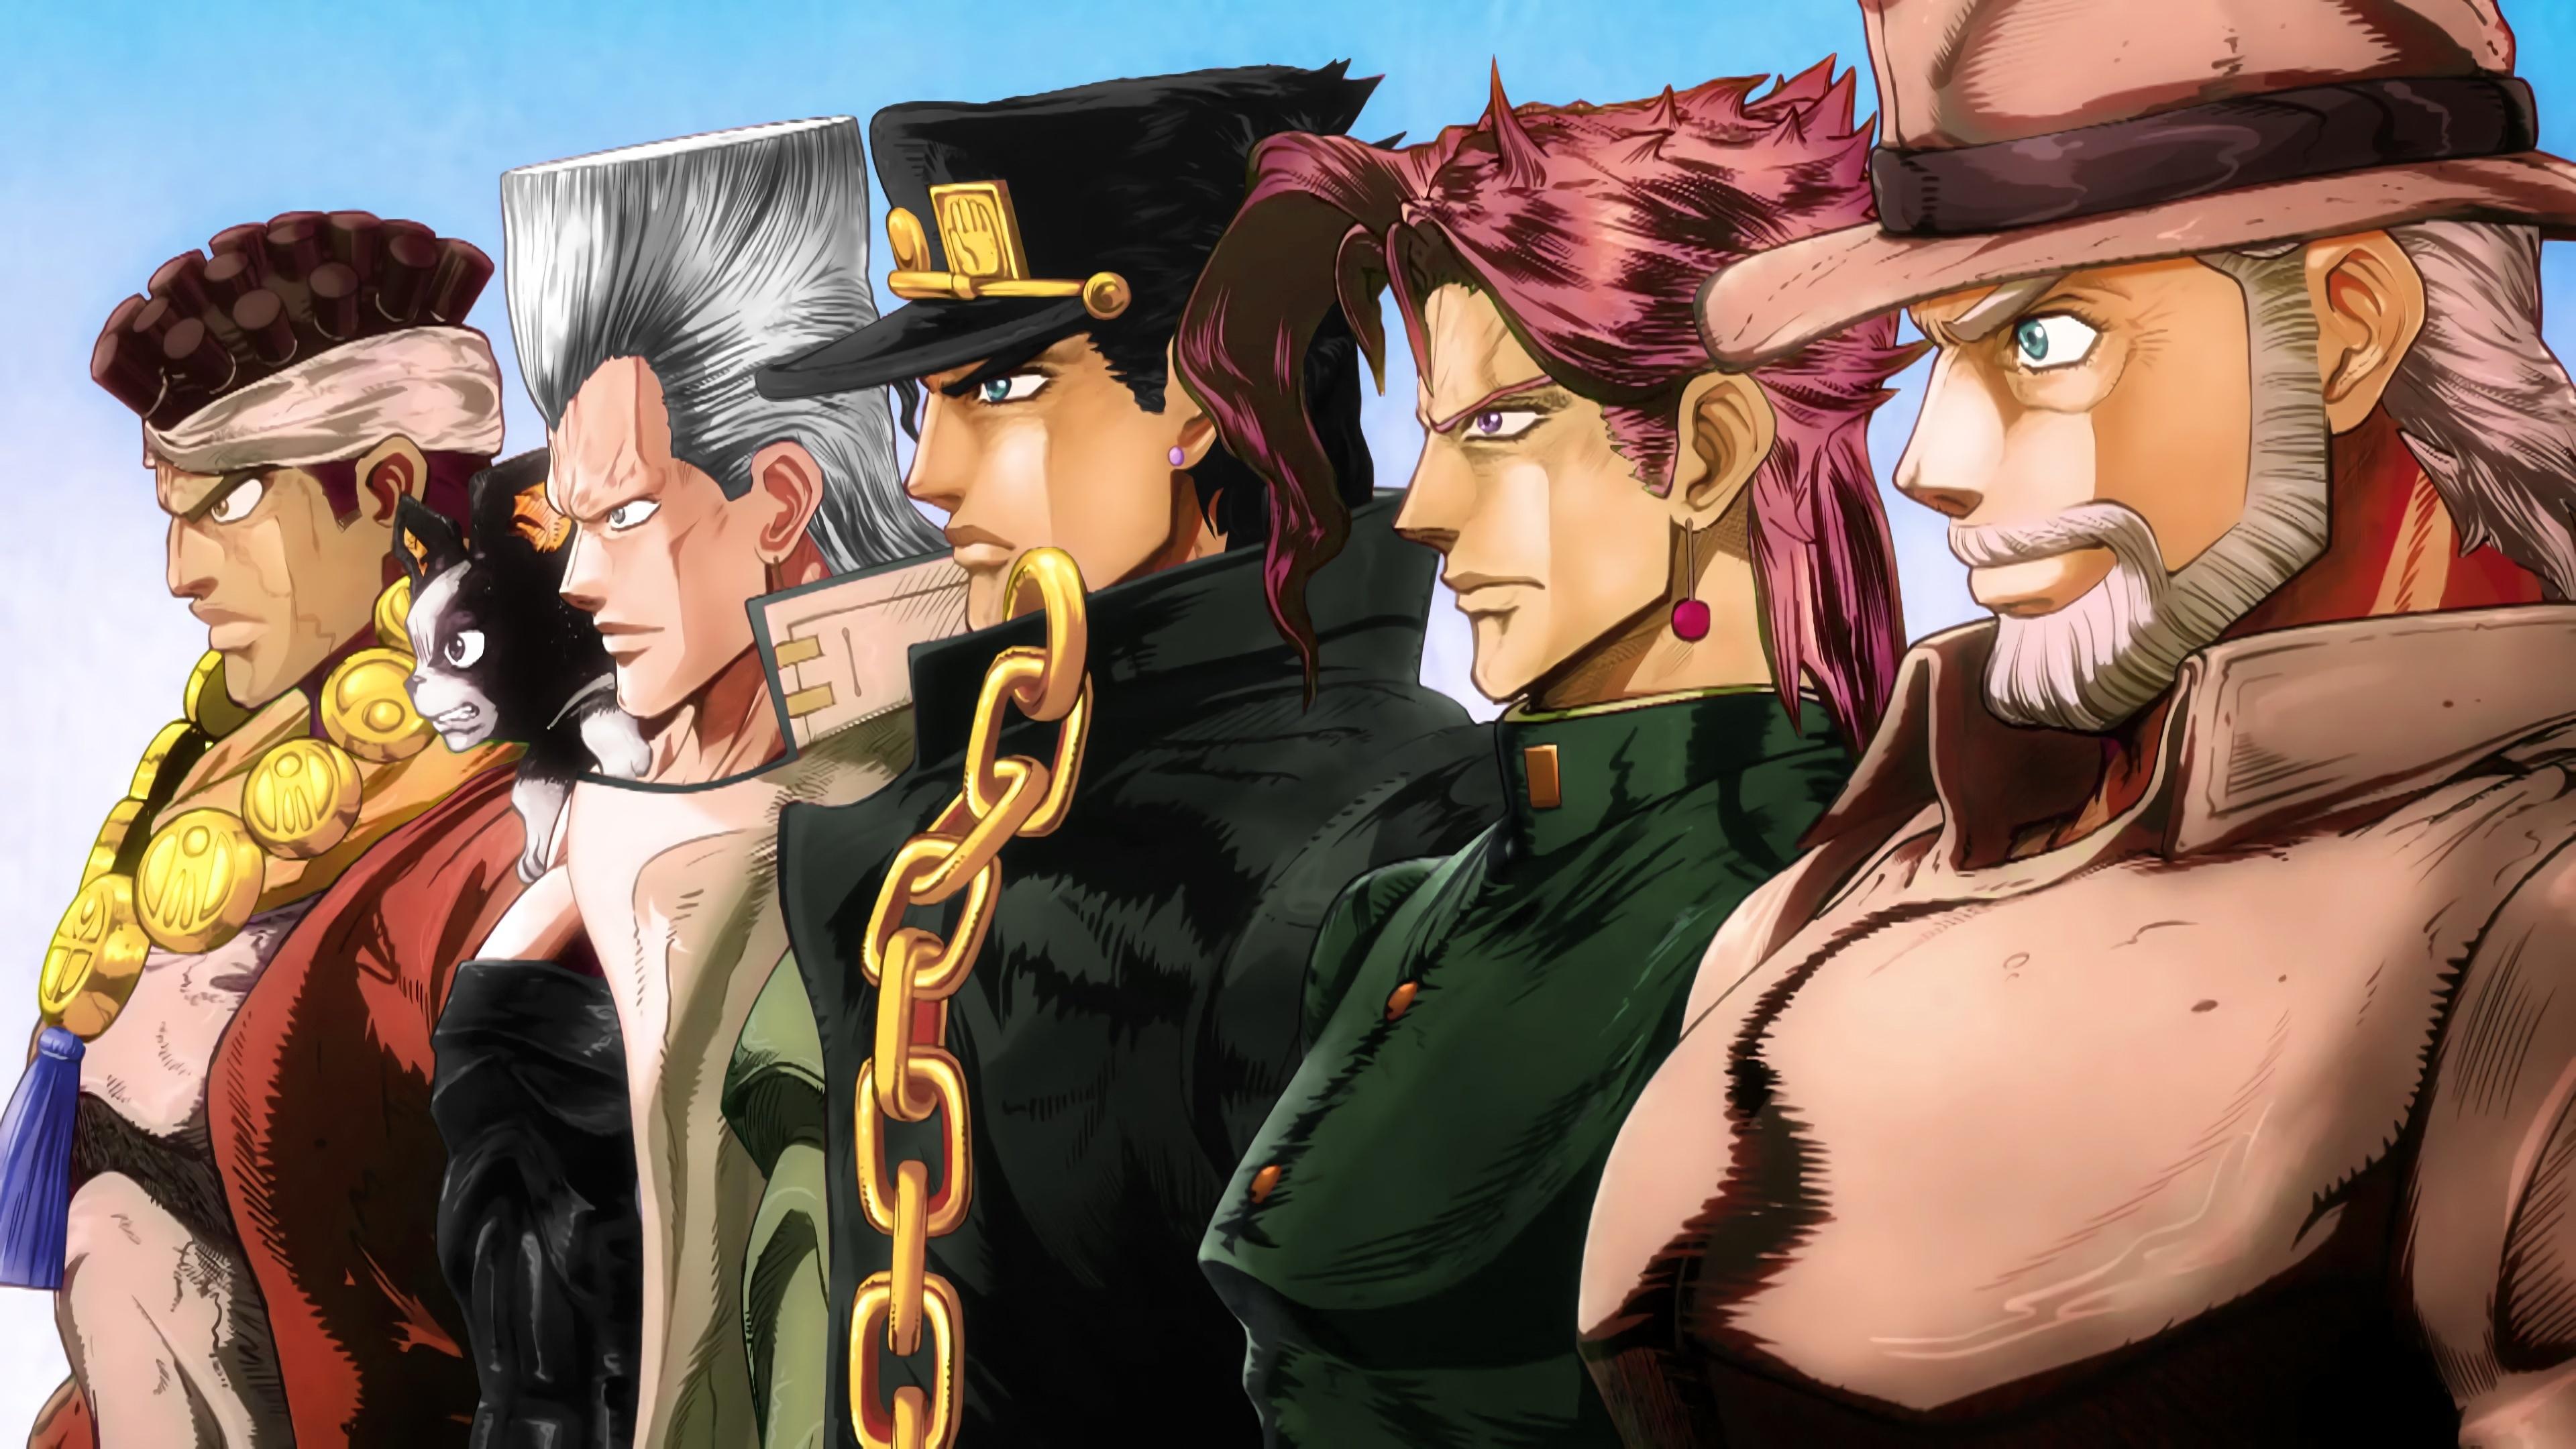 Download 3840x2400 Wallpaper Anime Boys Jojo S Bizarre Adventure Anime 4k Ultra Hd 16 10 Widescreen 3840x2400 Hd Image Background 3886